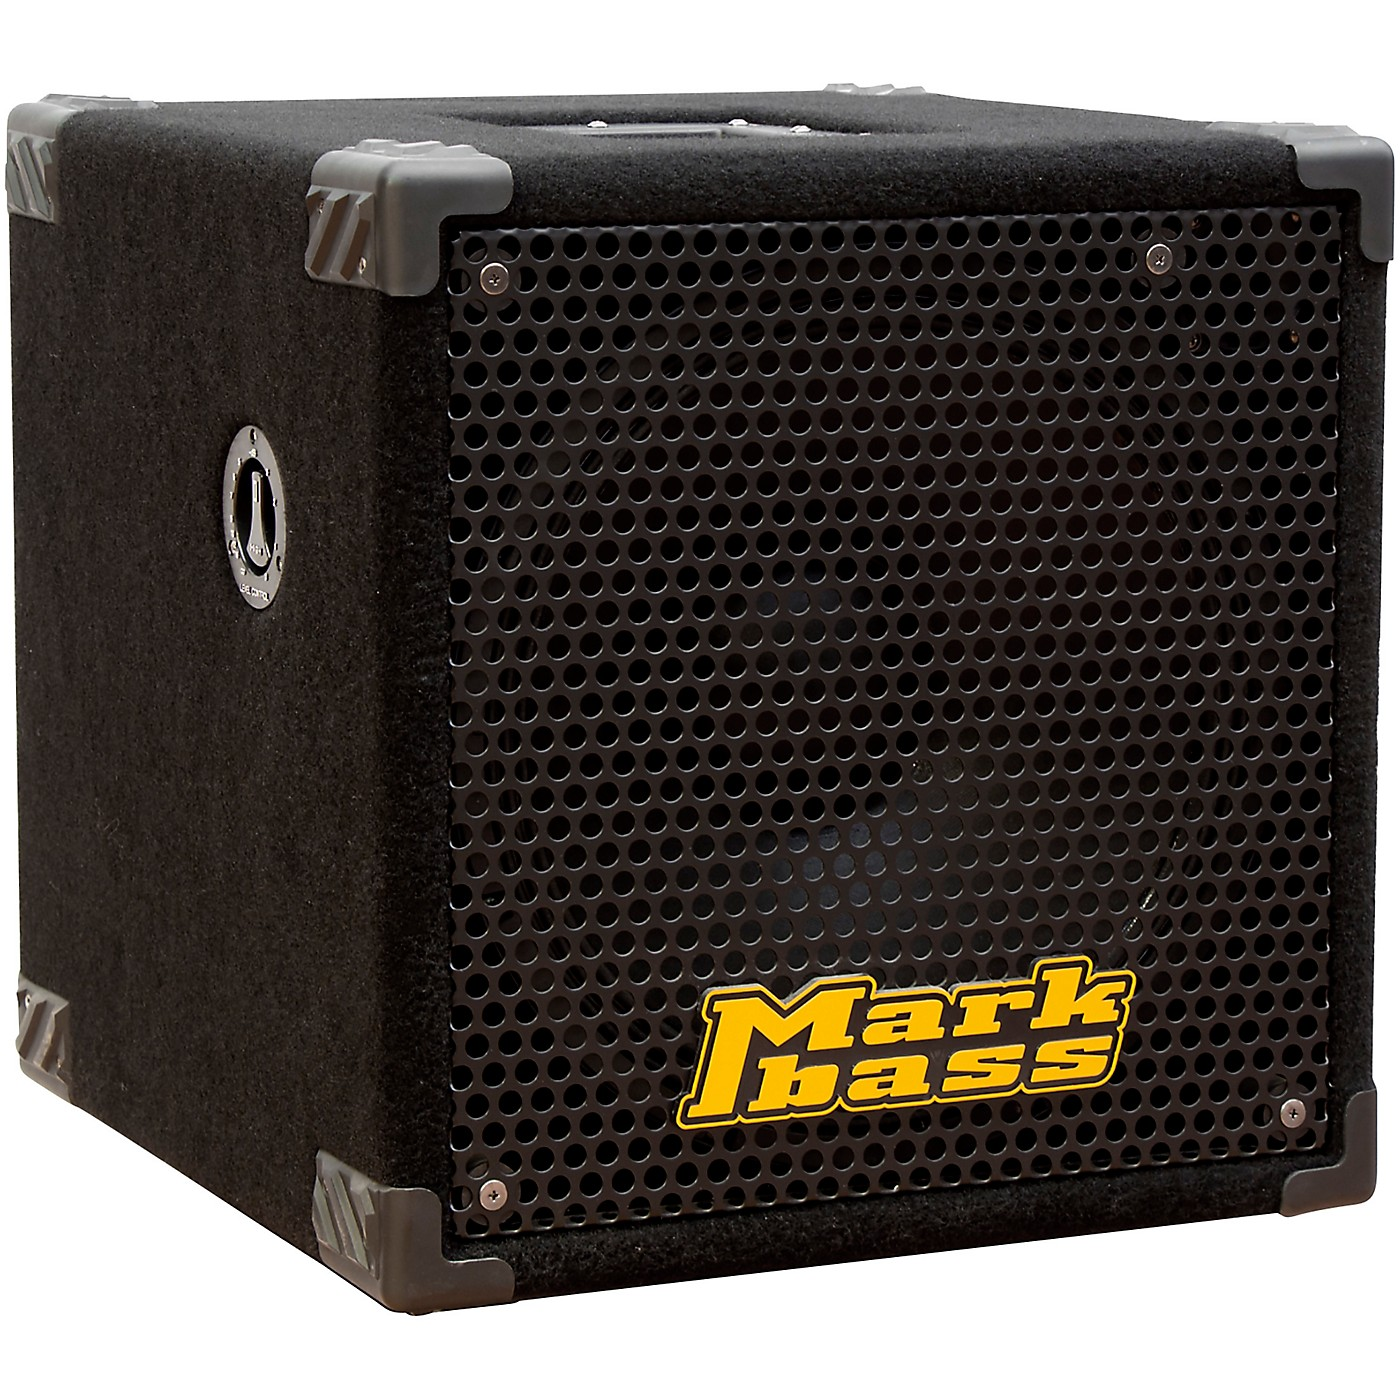 Markbass New York 151 Black 300W 1x15 Bass Speaker Cabinet thumbnail